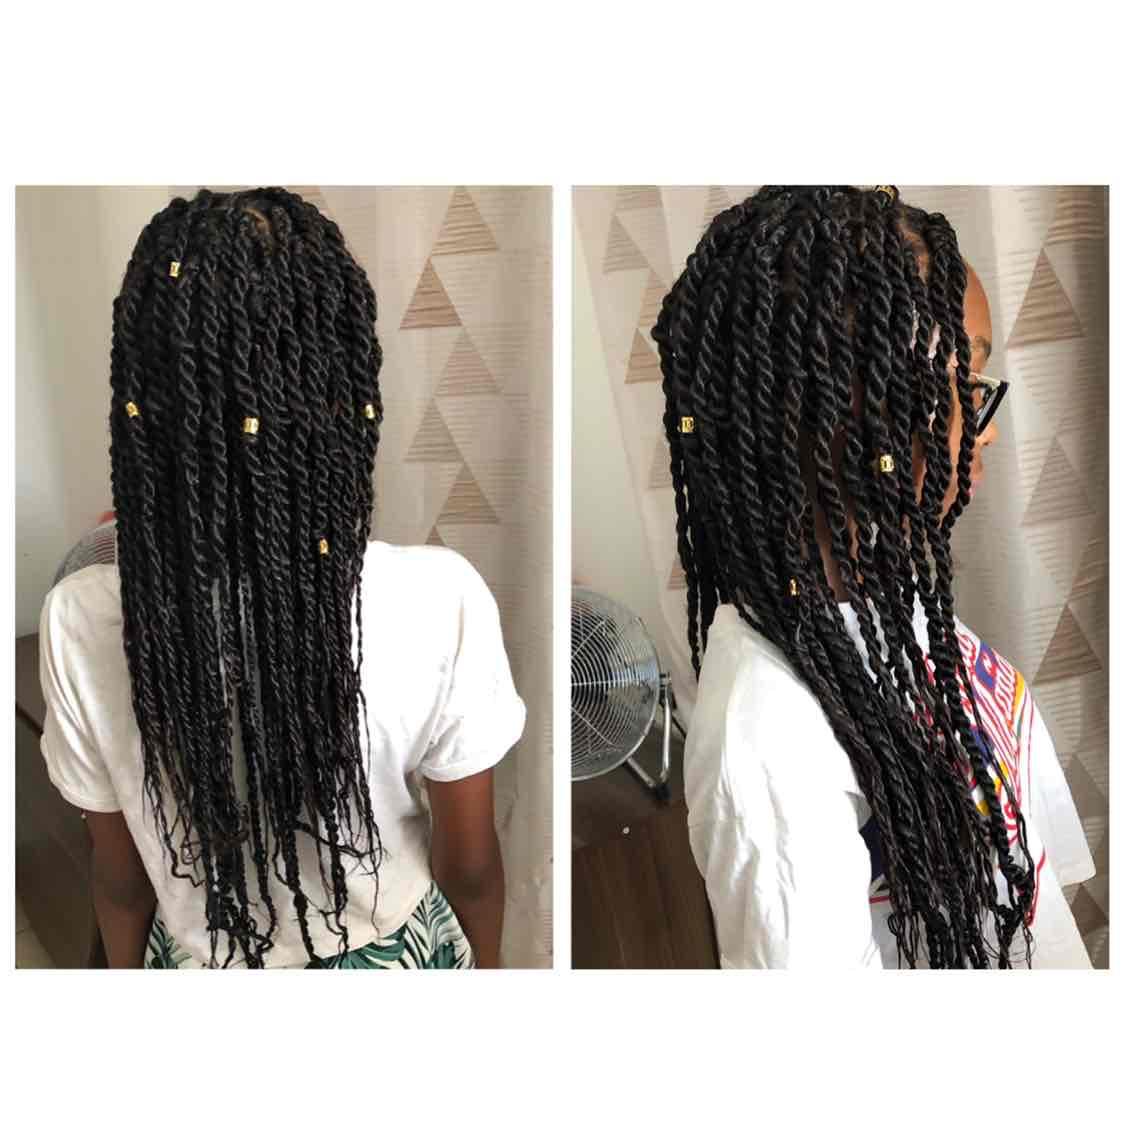 salon de coiffure afro tresse tresses box braids crochet braids vanilles tissages paris 75 77 78 91 92 93 94 95 ZUBGAYRK